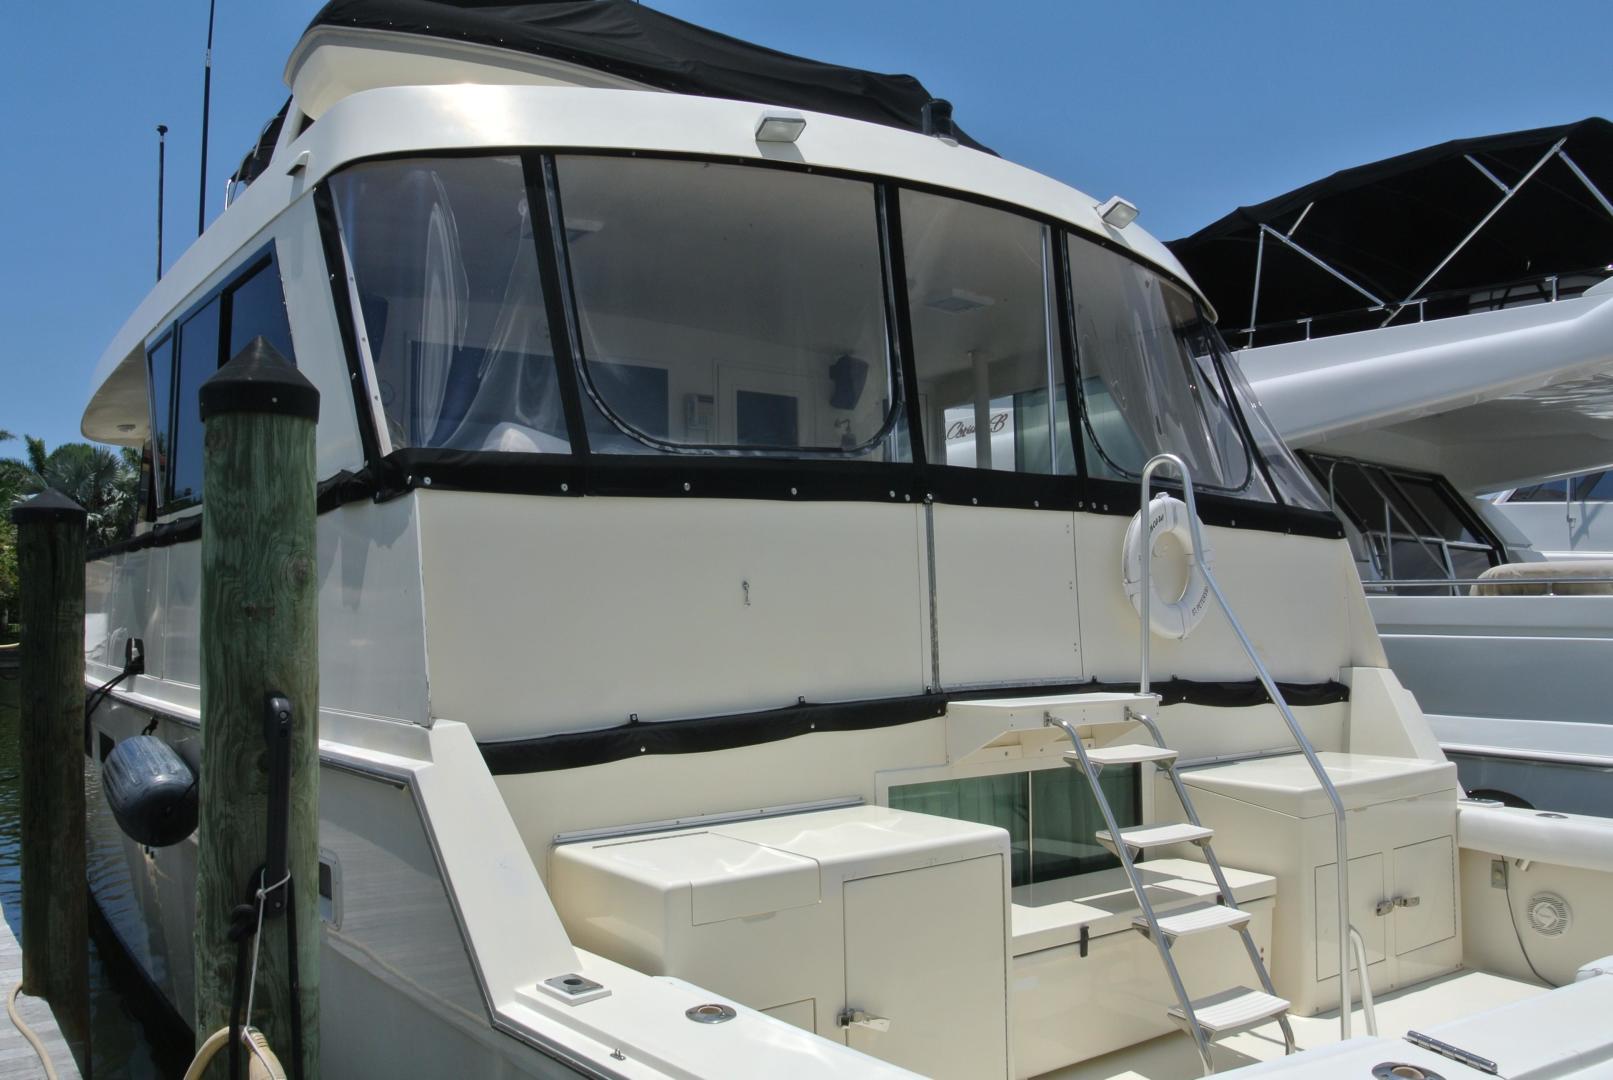 Hatteras-67-Cockpit-Motor-Yacht-1988-Lady-Encore-Saint-Petersburg-Florida-United-States-Aft-926170